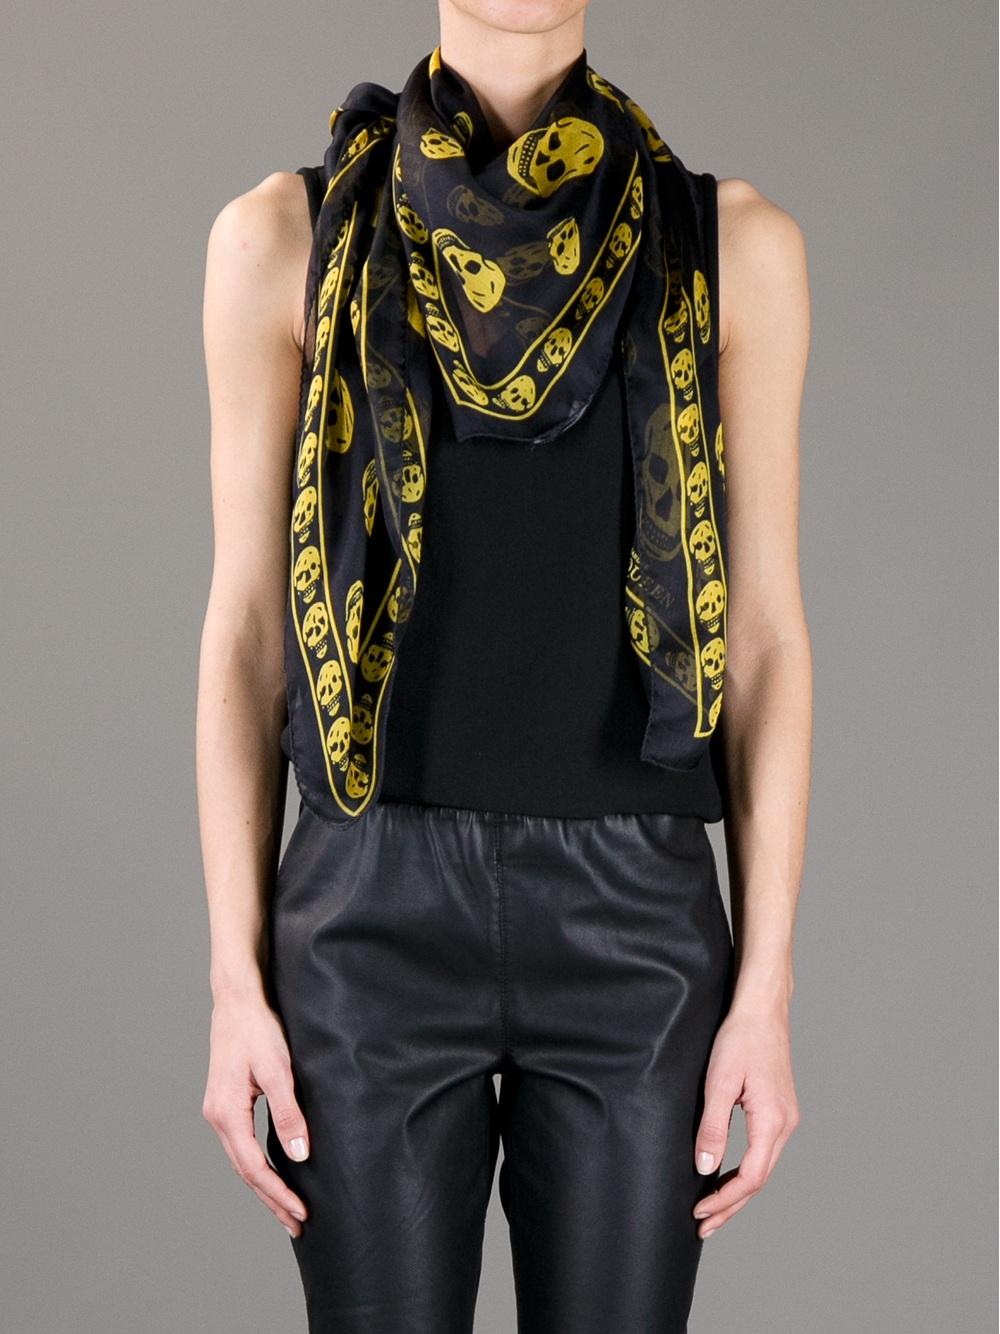 Alexander McQueen Skull Print Scarf in Black Yellow Lyst